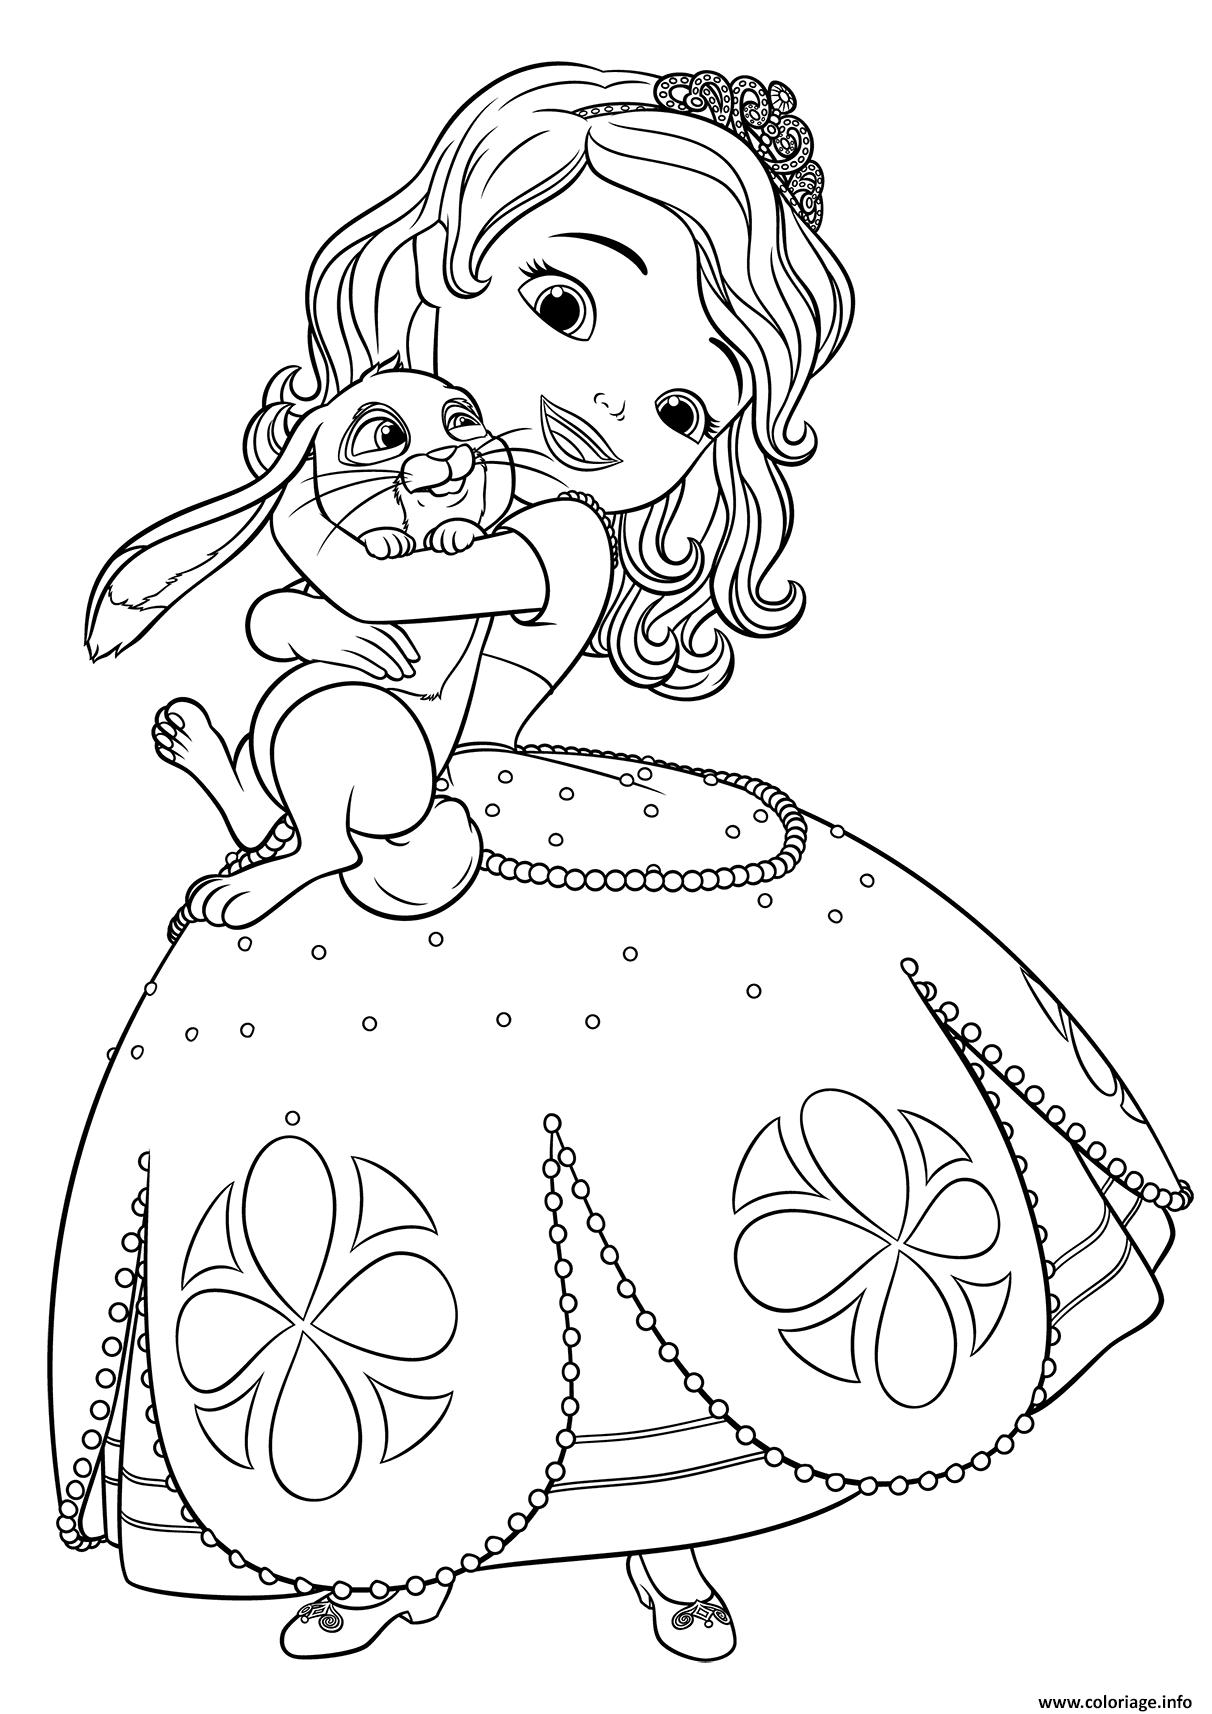 Coloriage Princesse Sofia Adore Son Lapin Jecolorie Com